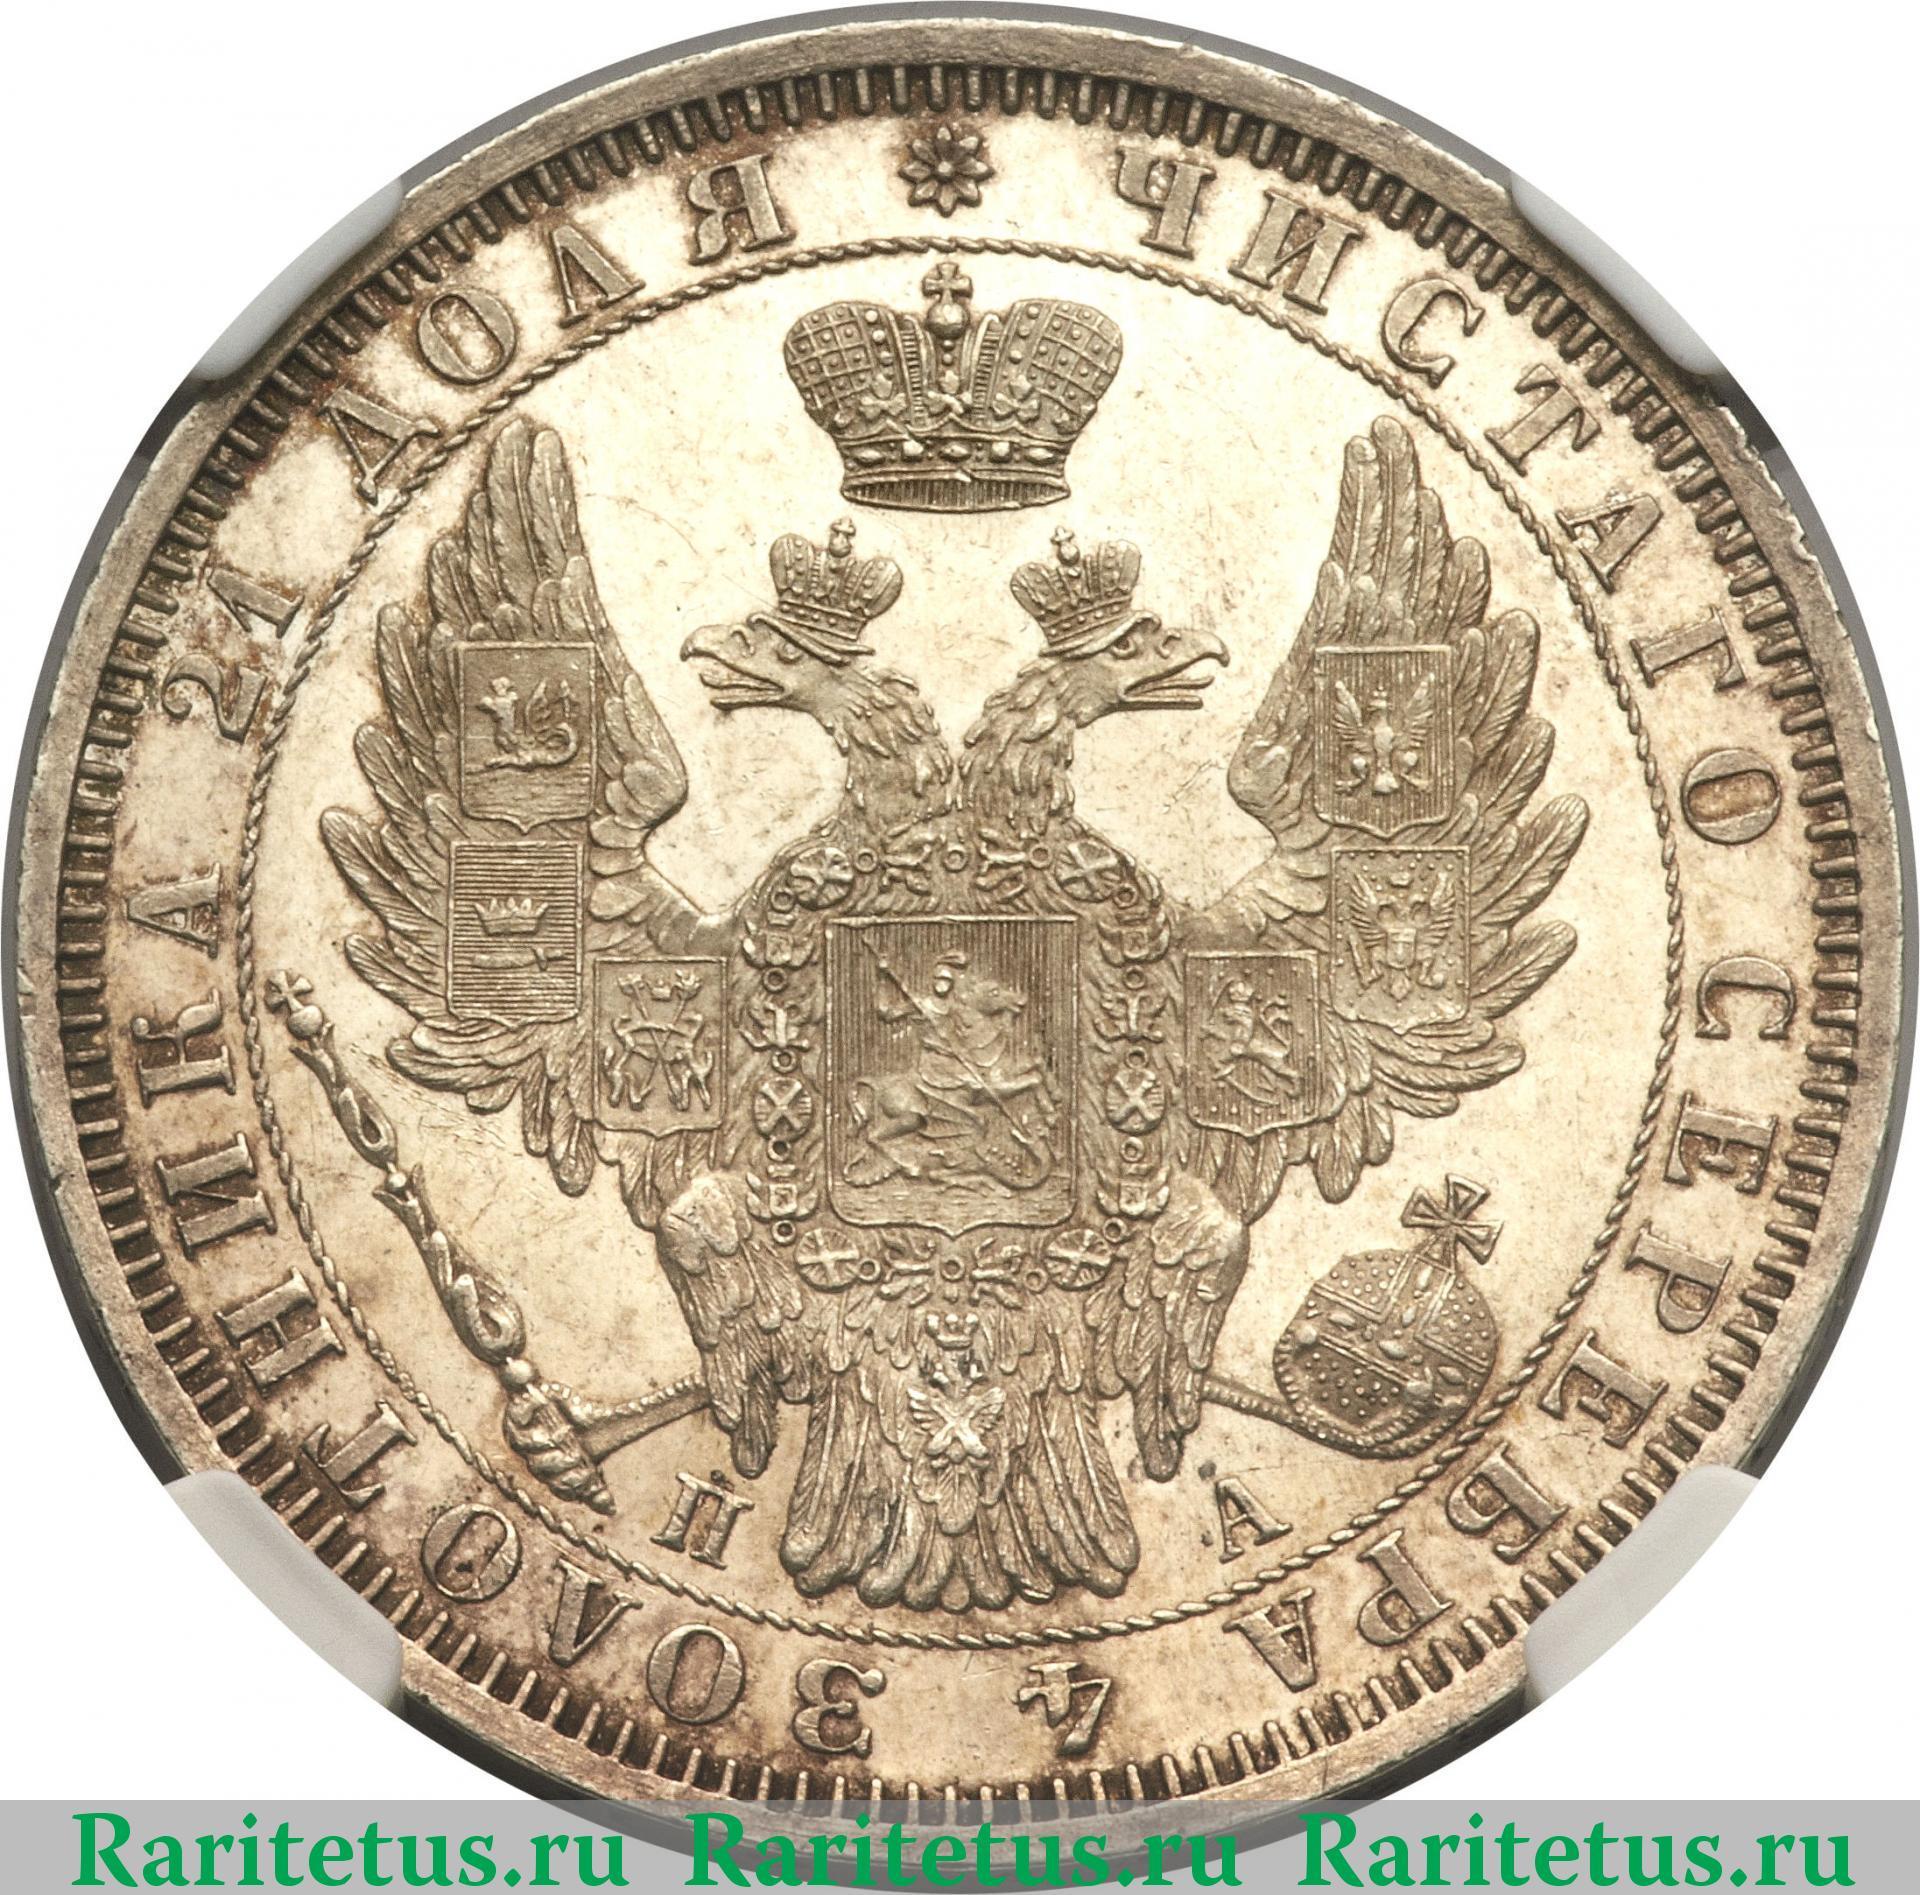 Аверс монеты 1 рубль 1851 года СПБ-ПА корона острая